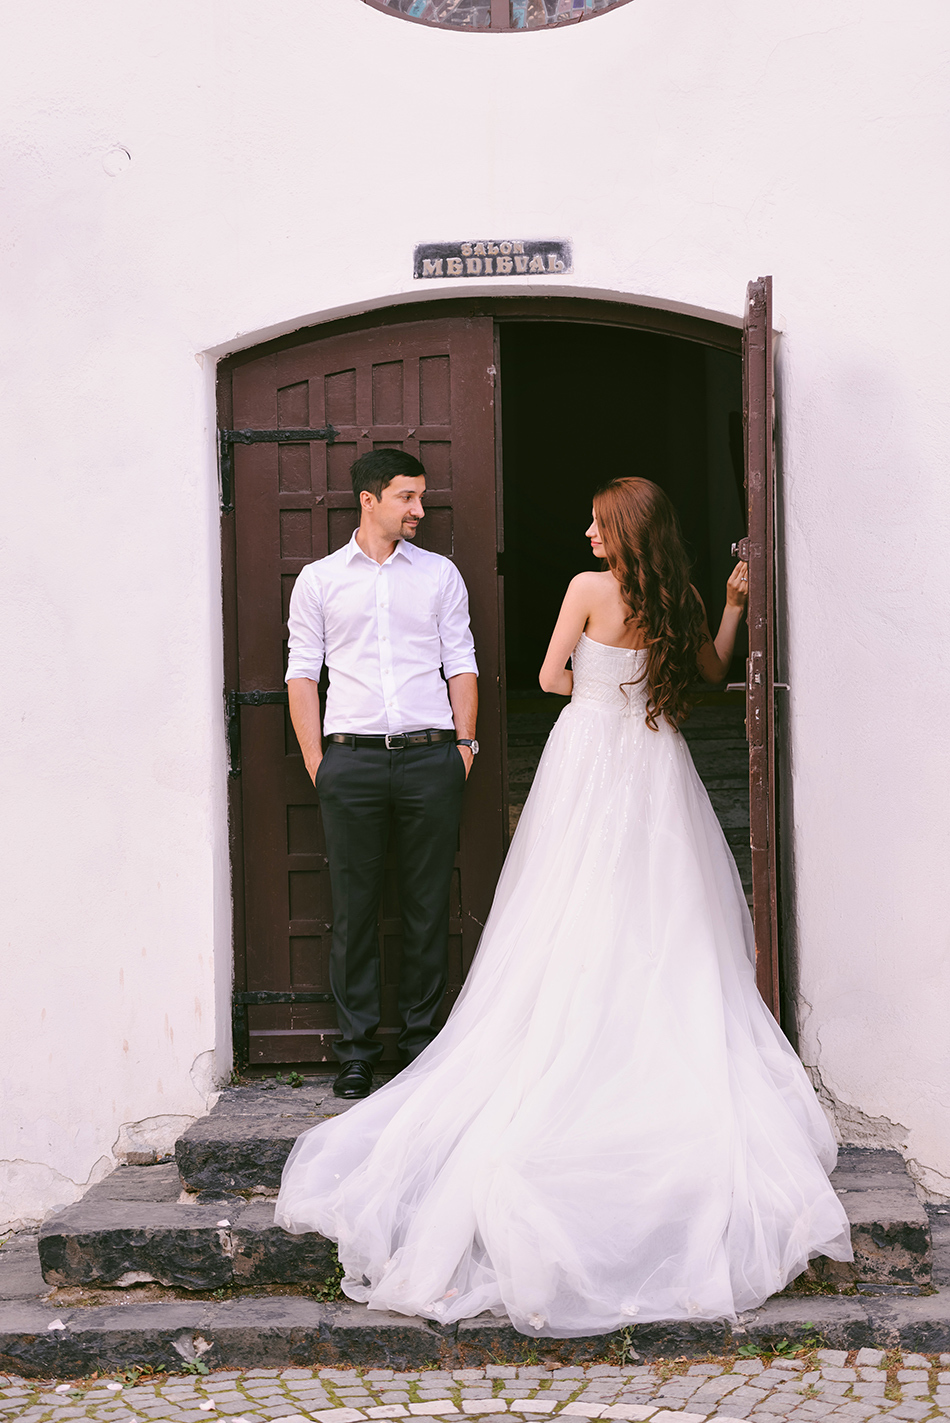 AD Passion Photography | fotograf-nunta-brasov-poiana-brasov-fotograf-profesionist_lorena-cristi_ttd_0036 | Adelin, Dida, fotograf profesionist, fotograf de nunta, fotografie de nunta, fotograf Timisoara, fotograf Craiova, fotograf Bucuresti, fotograf Arad, nunta Timisoara, nunta Arad, nunta Bucuresti, nunta Craiova